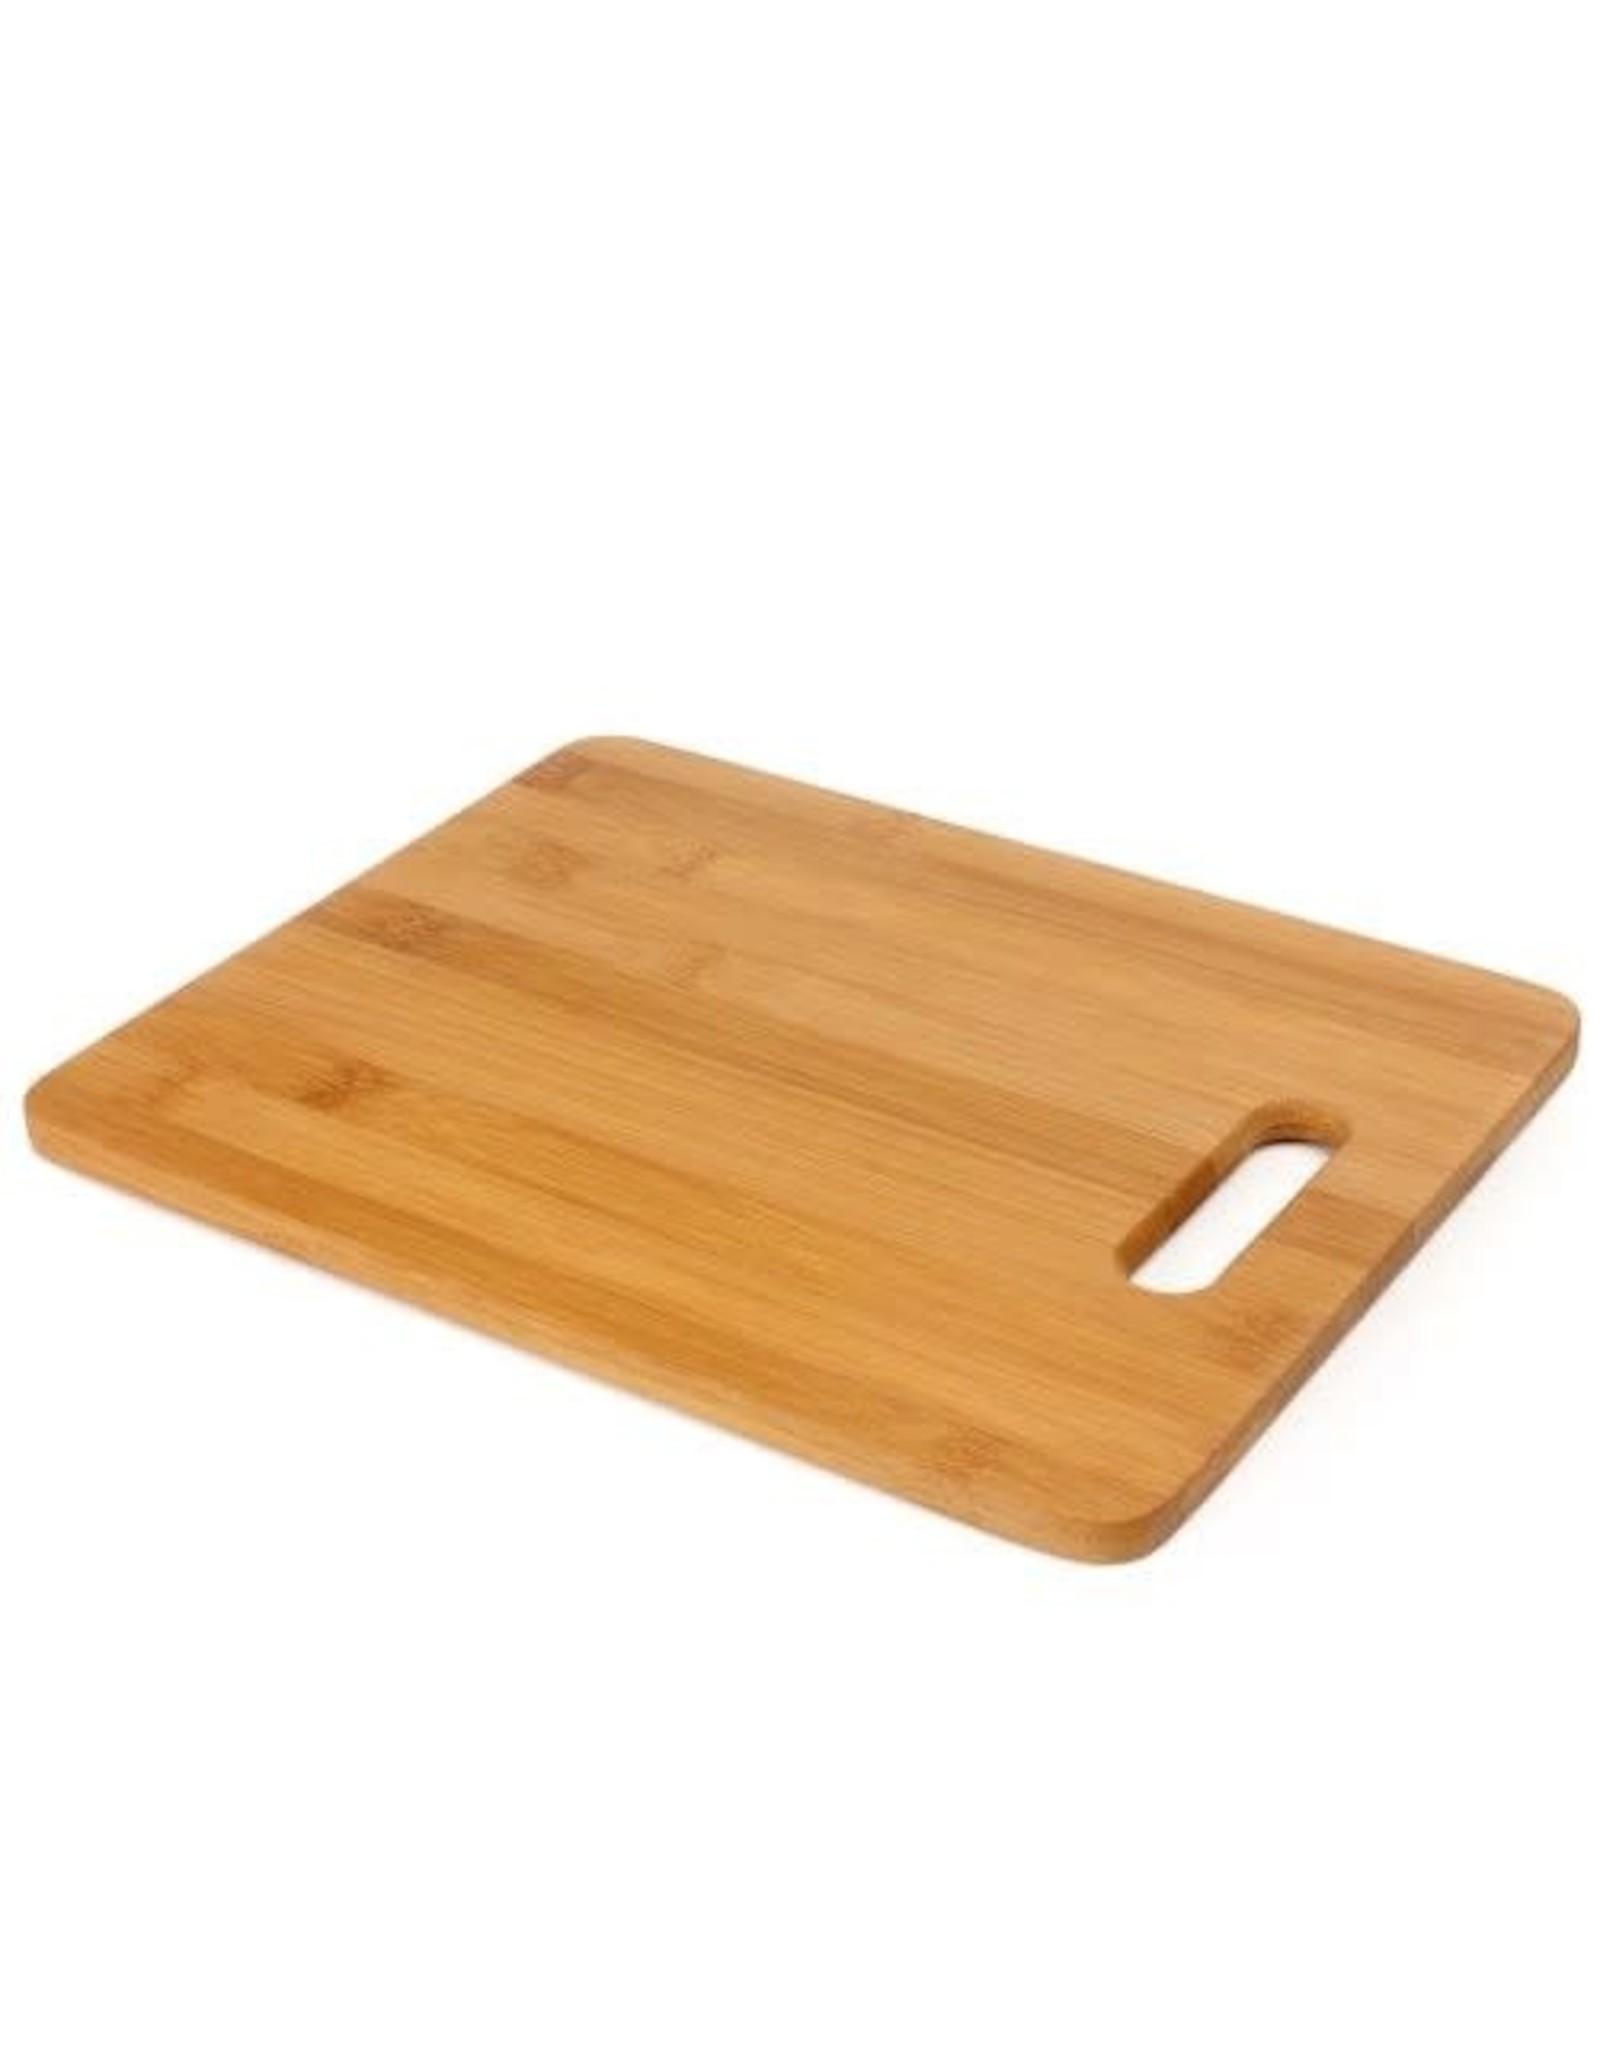 "Bamboo Cutting Board 15x11.5"""